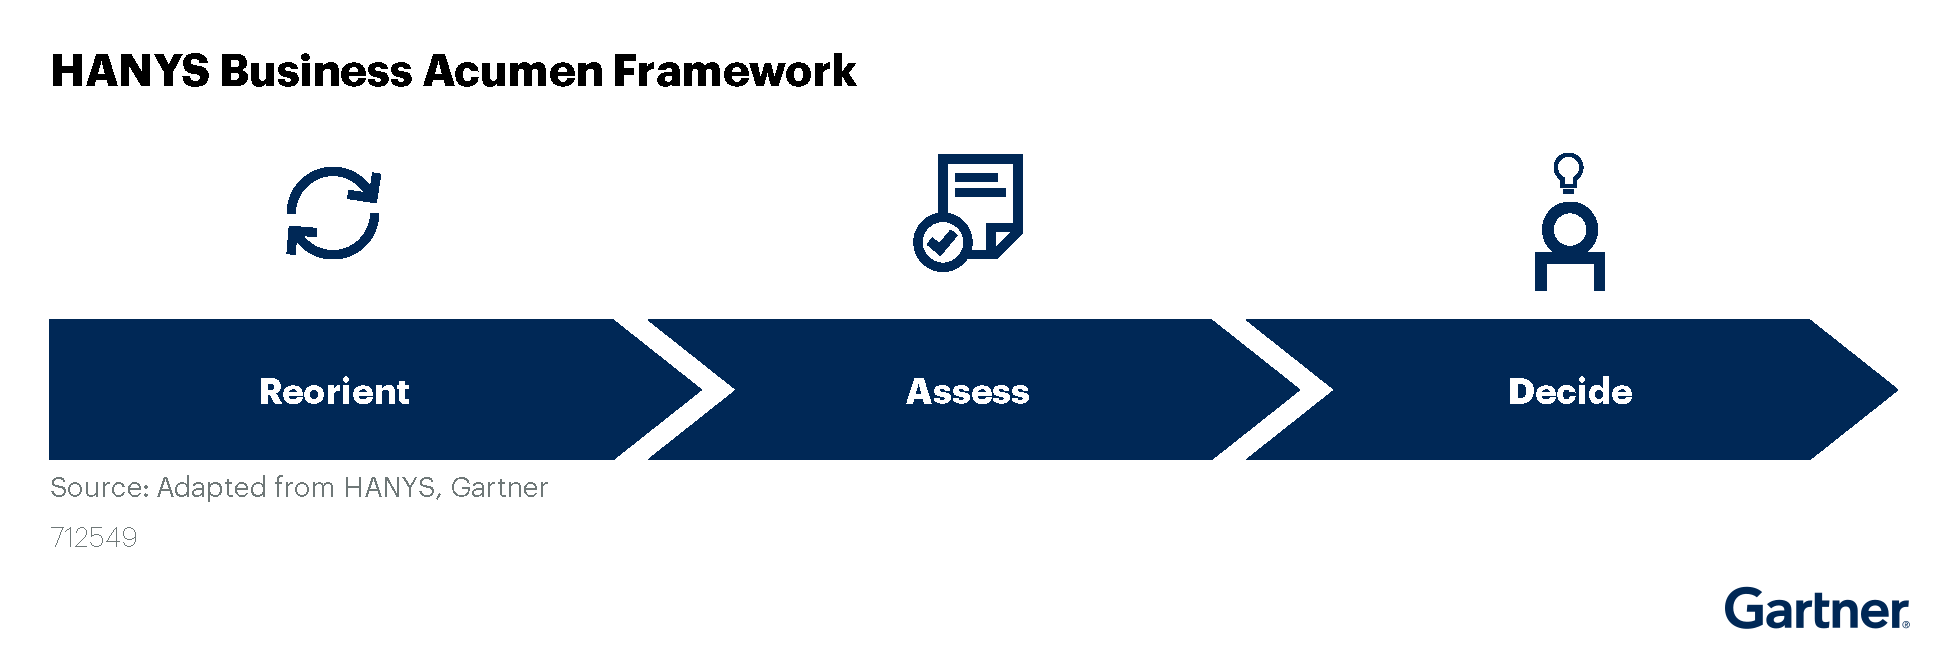 Figure 1: HANYS Business Acumen Framework